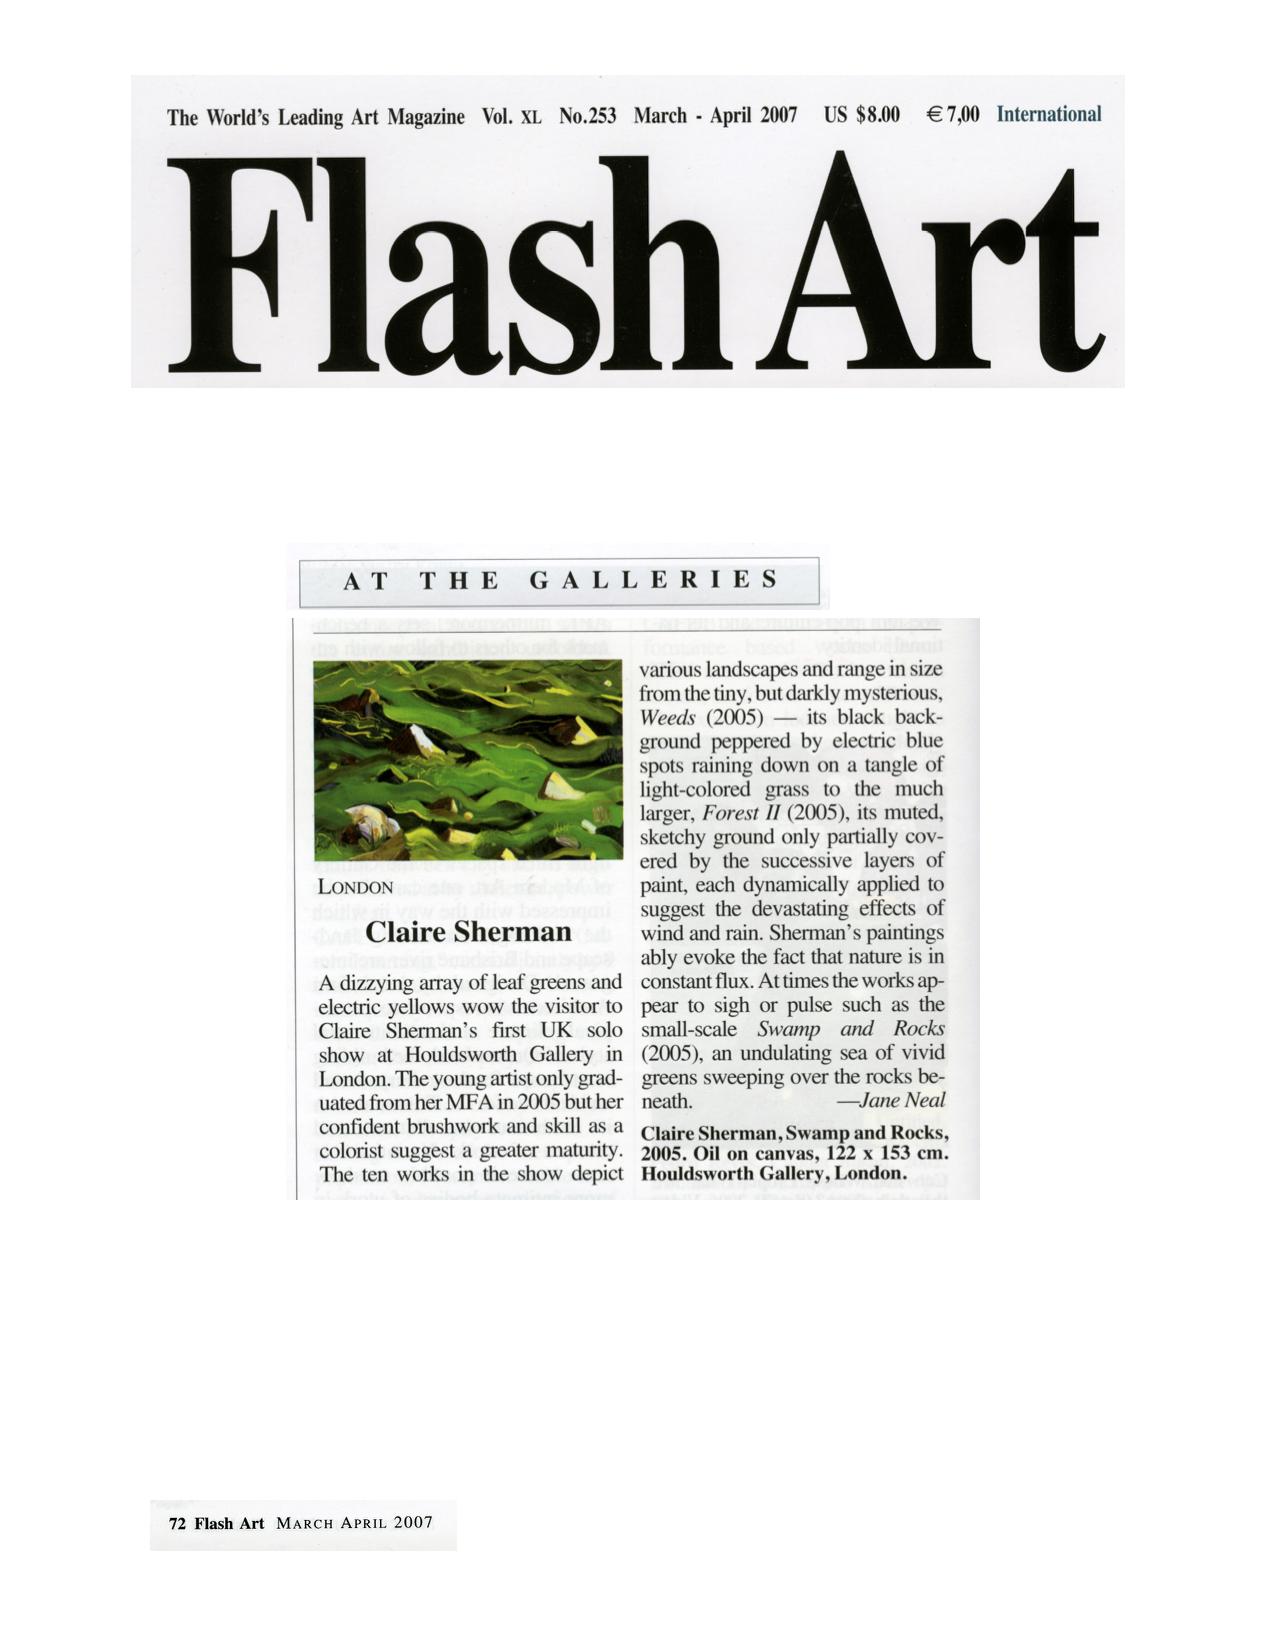 Flash Art, March/April 2007